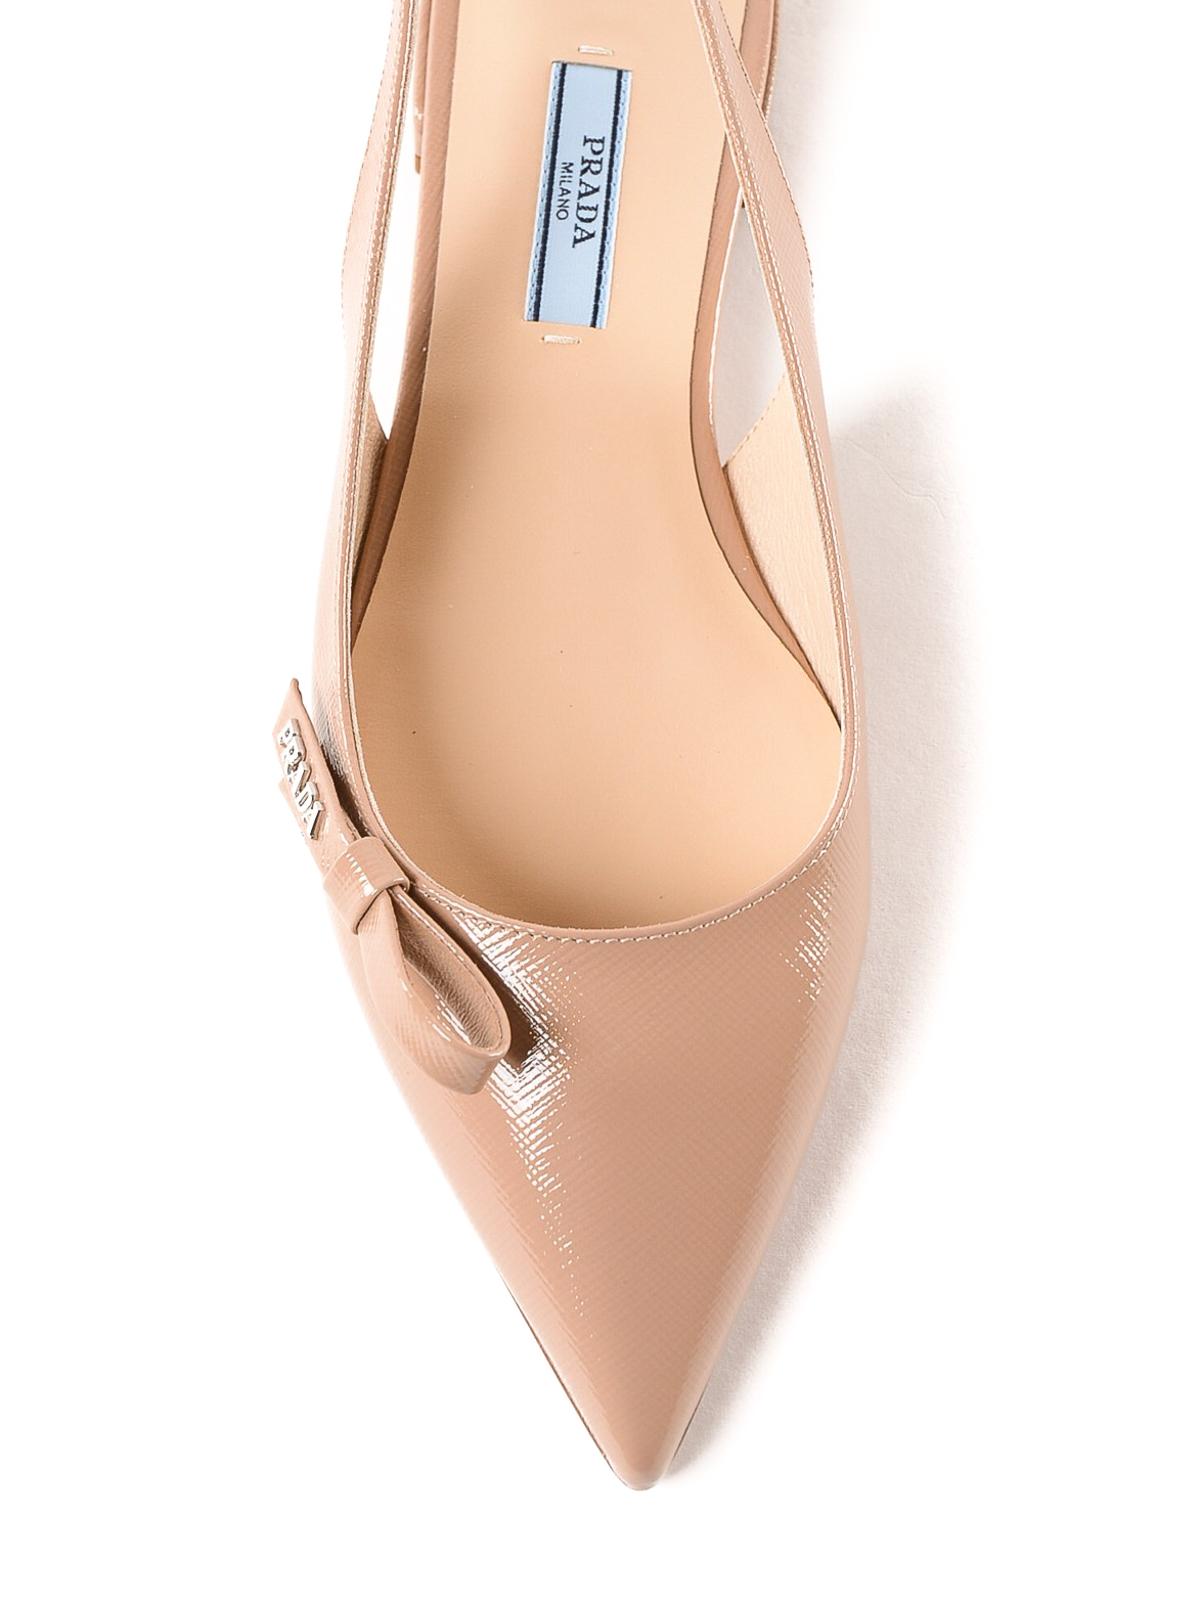 02ab00de4f36 iKRIX PRADA  sandals - Pink patent leather slingback flat sandals